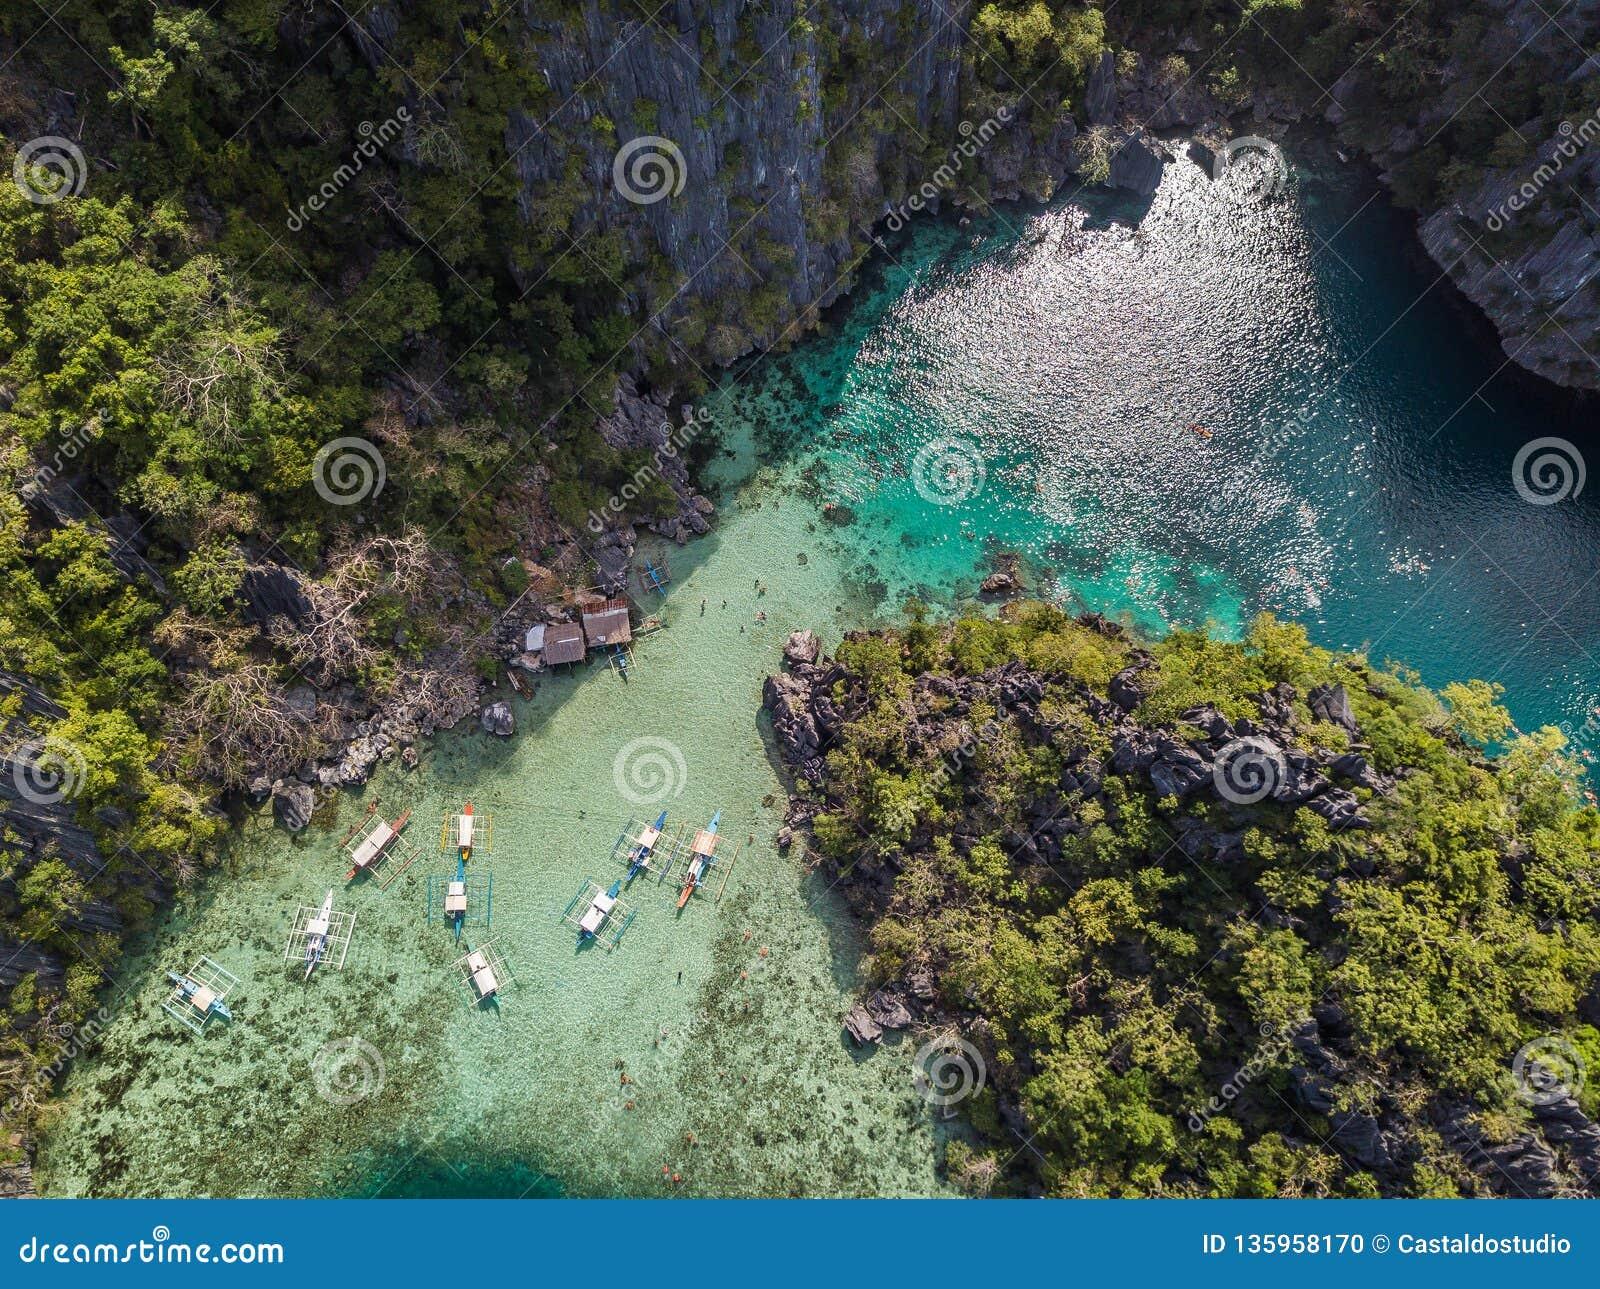 Coron Island In Palawan Philippines Stock Photo Image Of